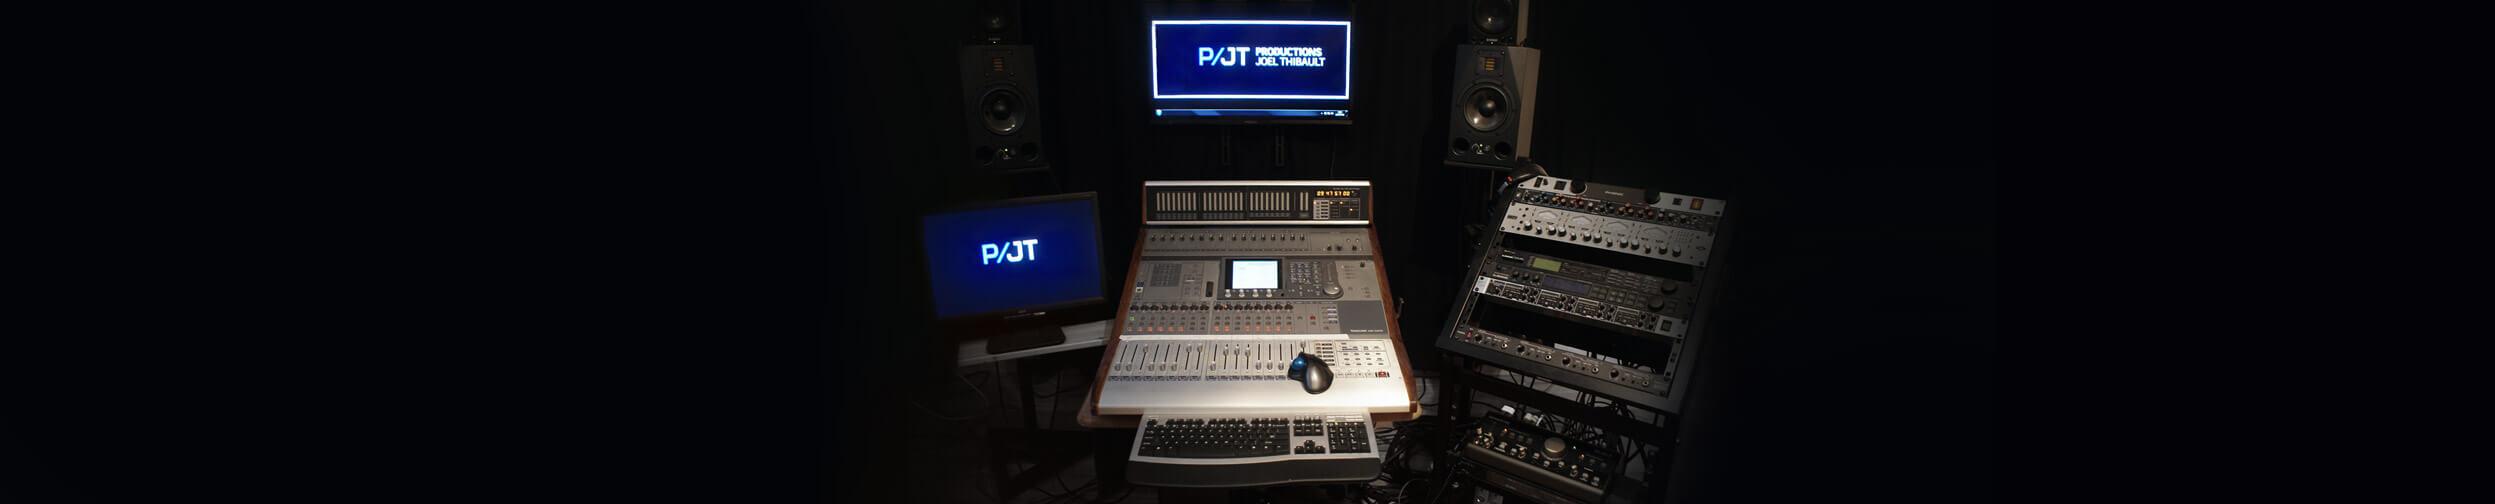 studio-md